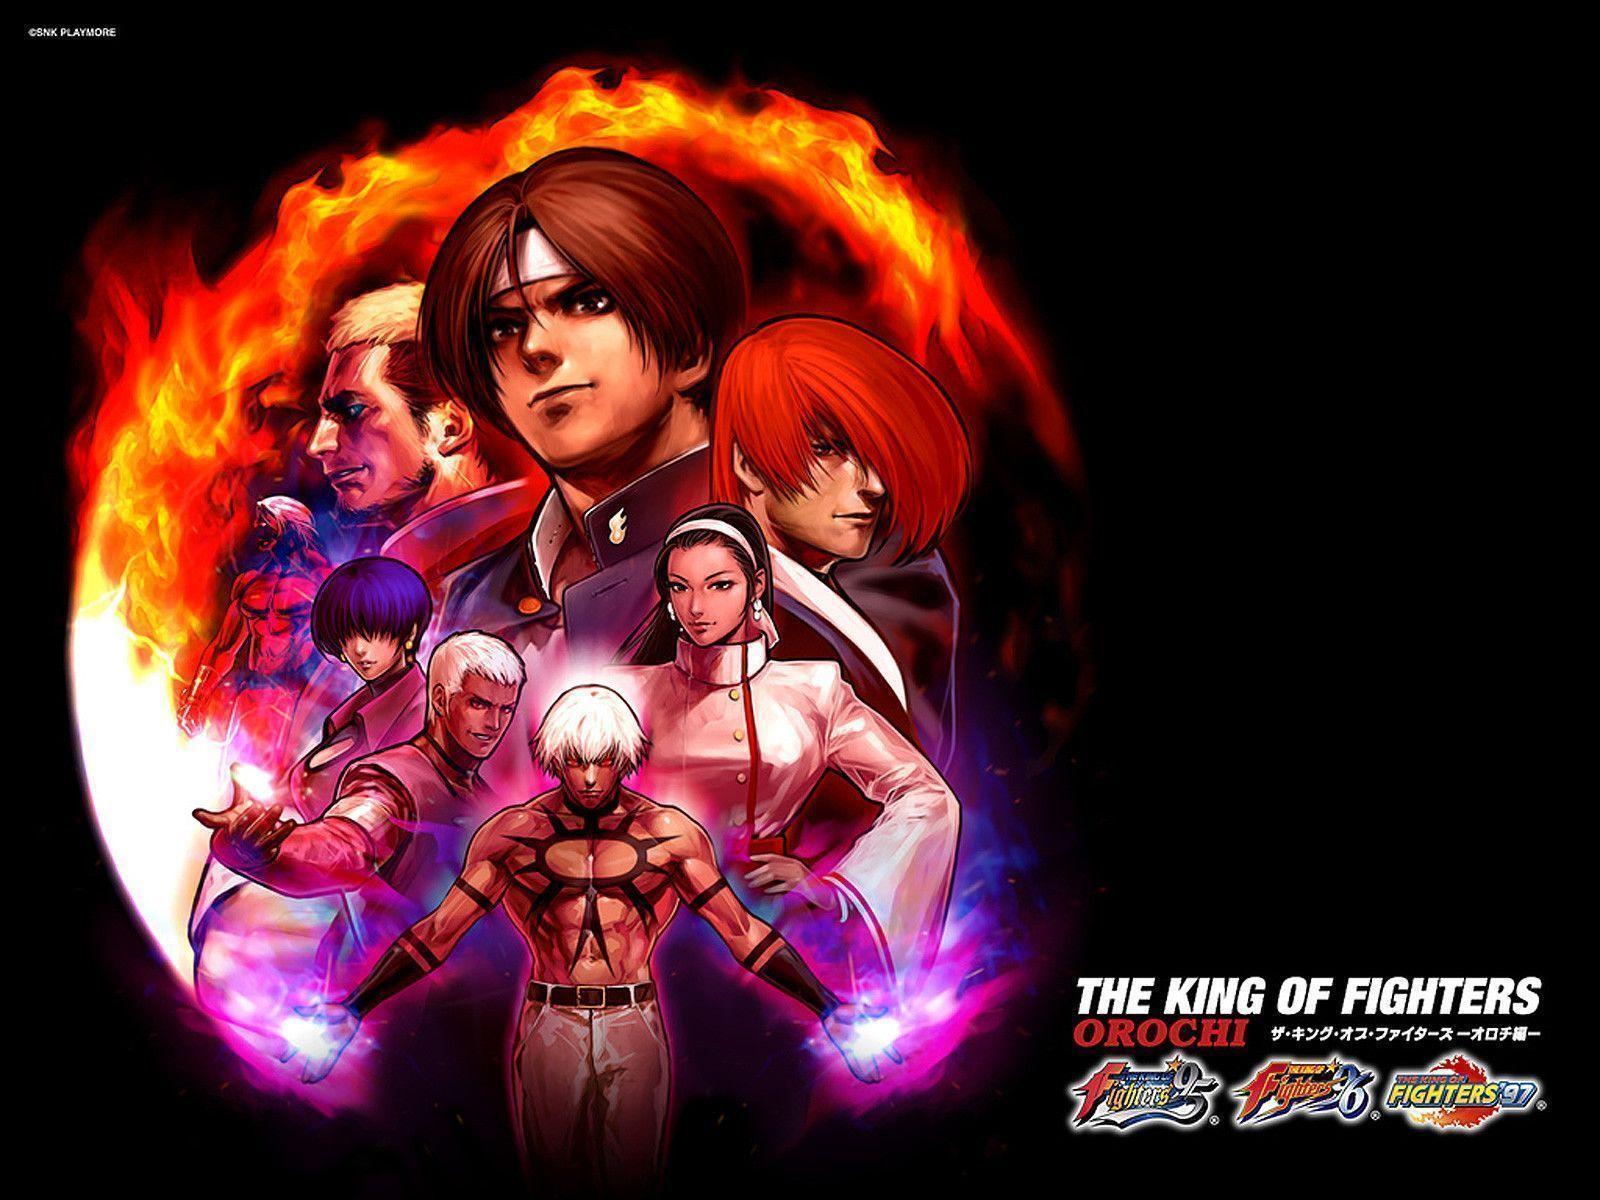 72+] King Of Fighters Wallpaper on WallpaperSafari